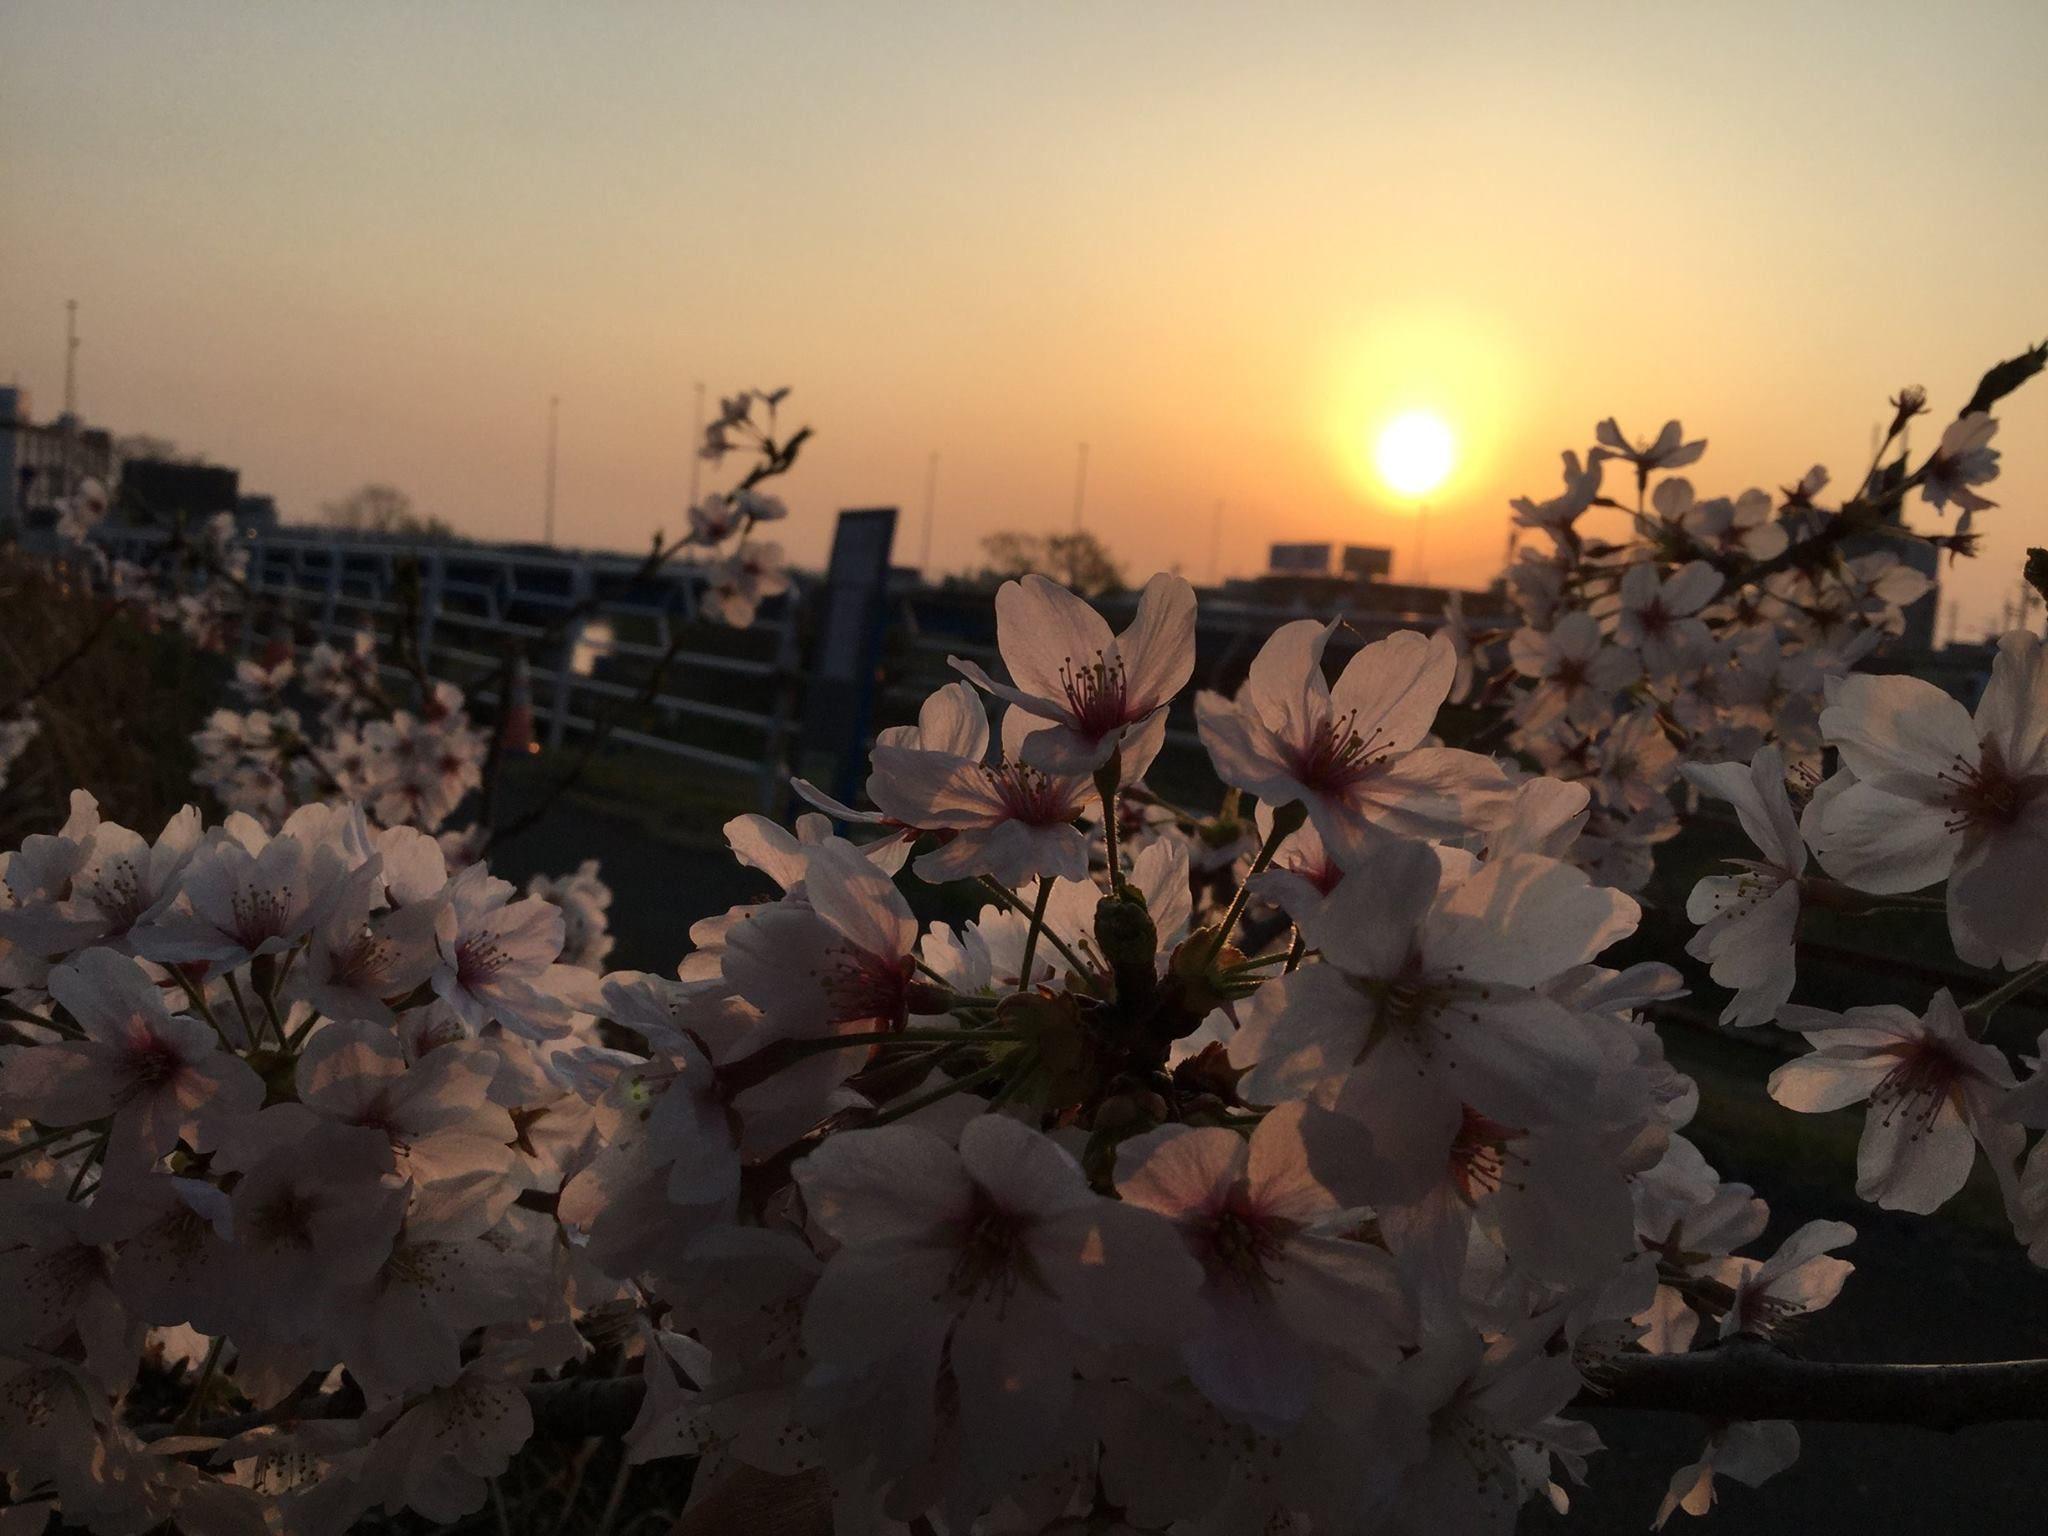 Pink cherry blossoms in setting sun – Chamila Nirohsinie (Niro)